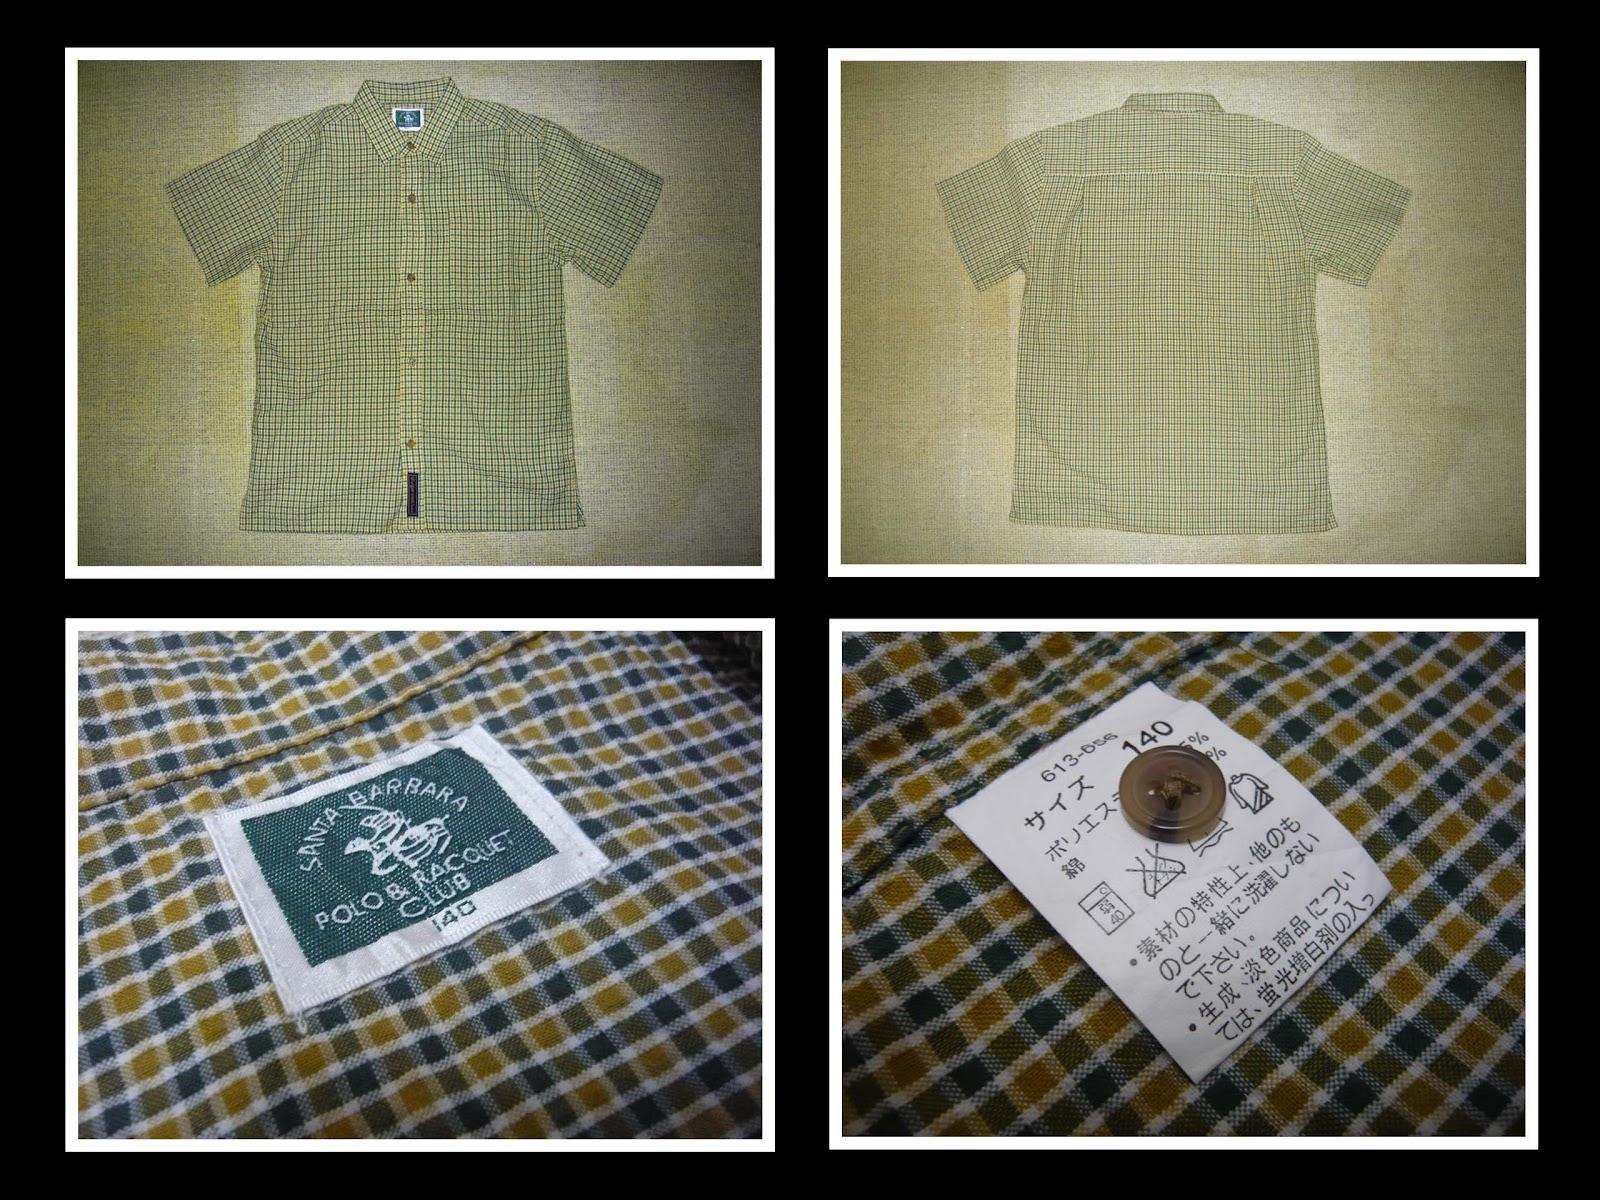 Mudskipper 39 s used goods santa barbara polo button down shirt for Santa barbara polo shirt